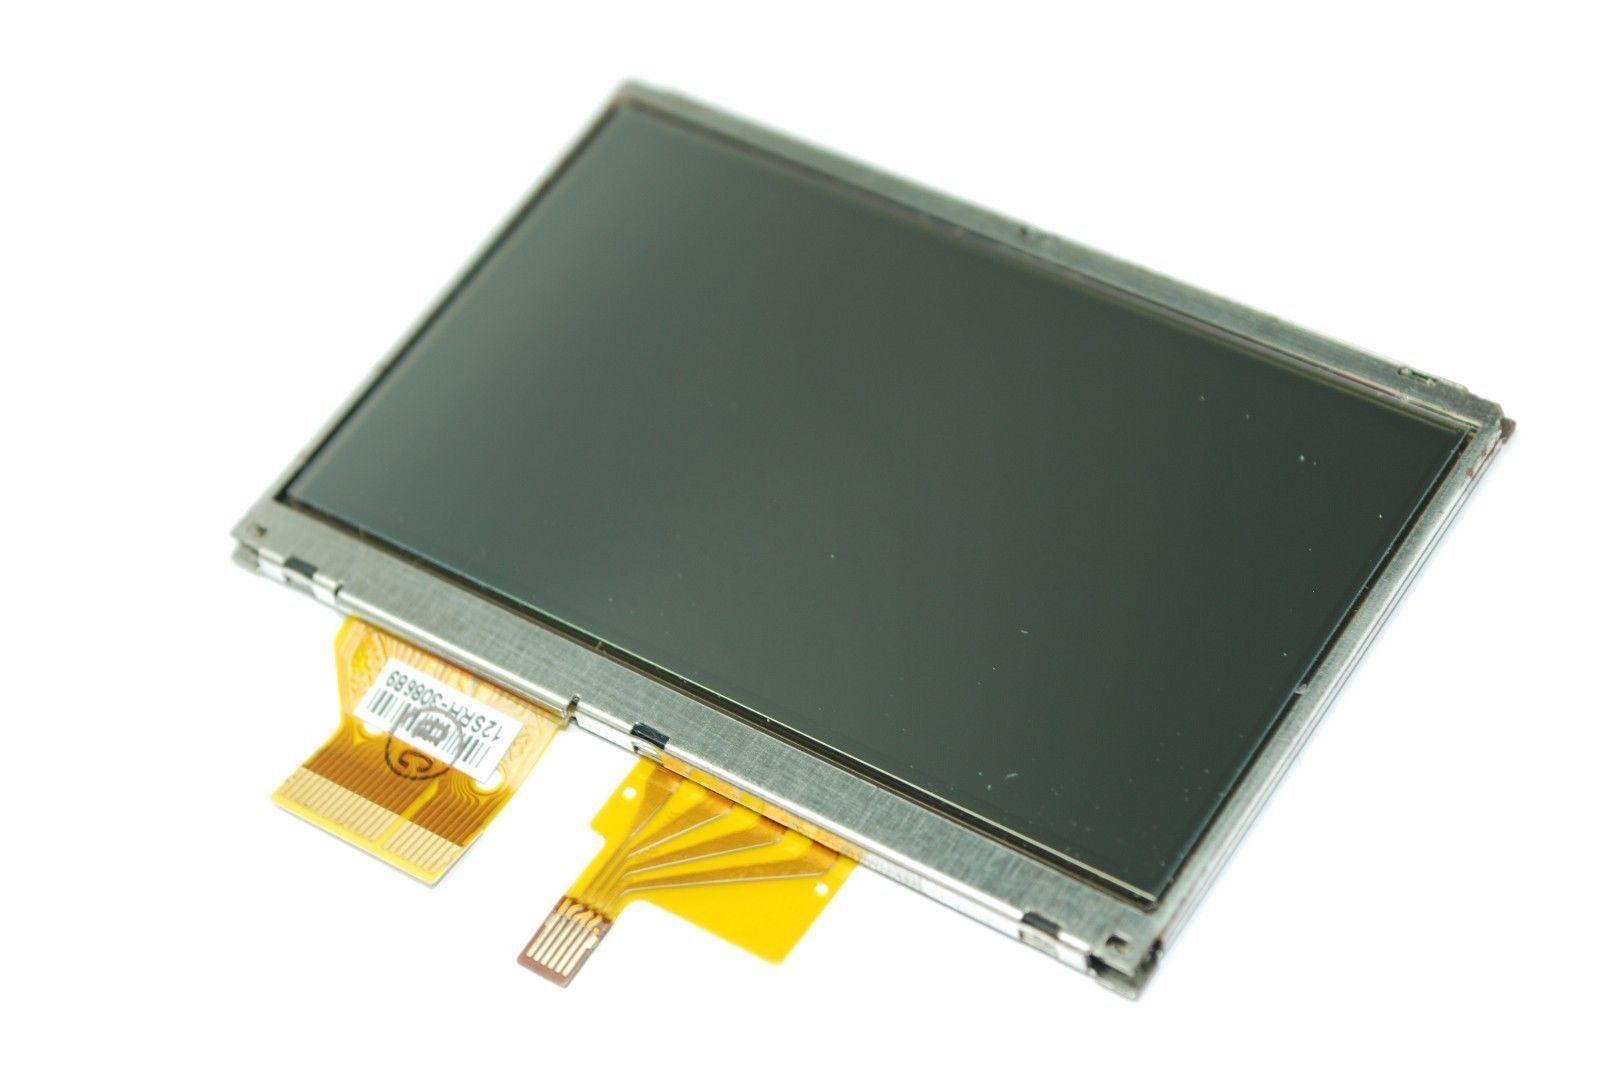 Sony Dcr-sr10 Sr10e Sr200 Sr210 Sr210e Sr220 Sr220e Sr220...